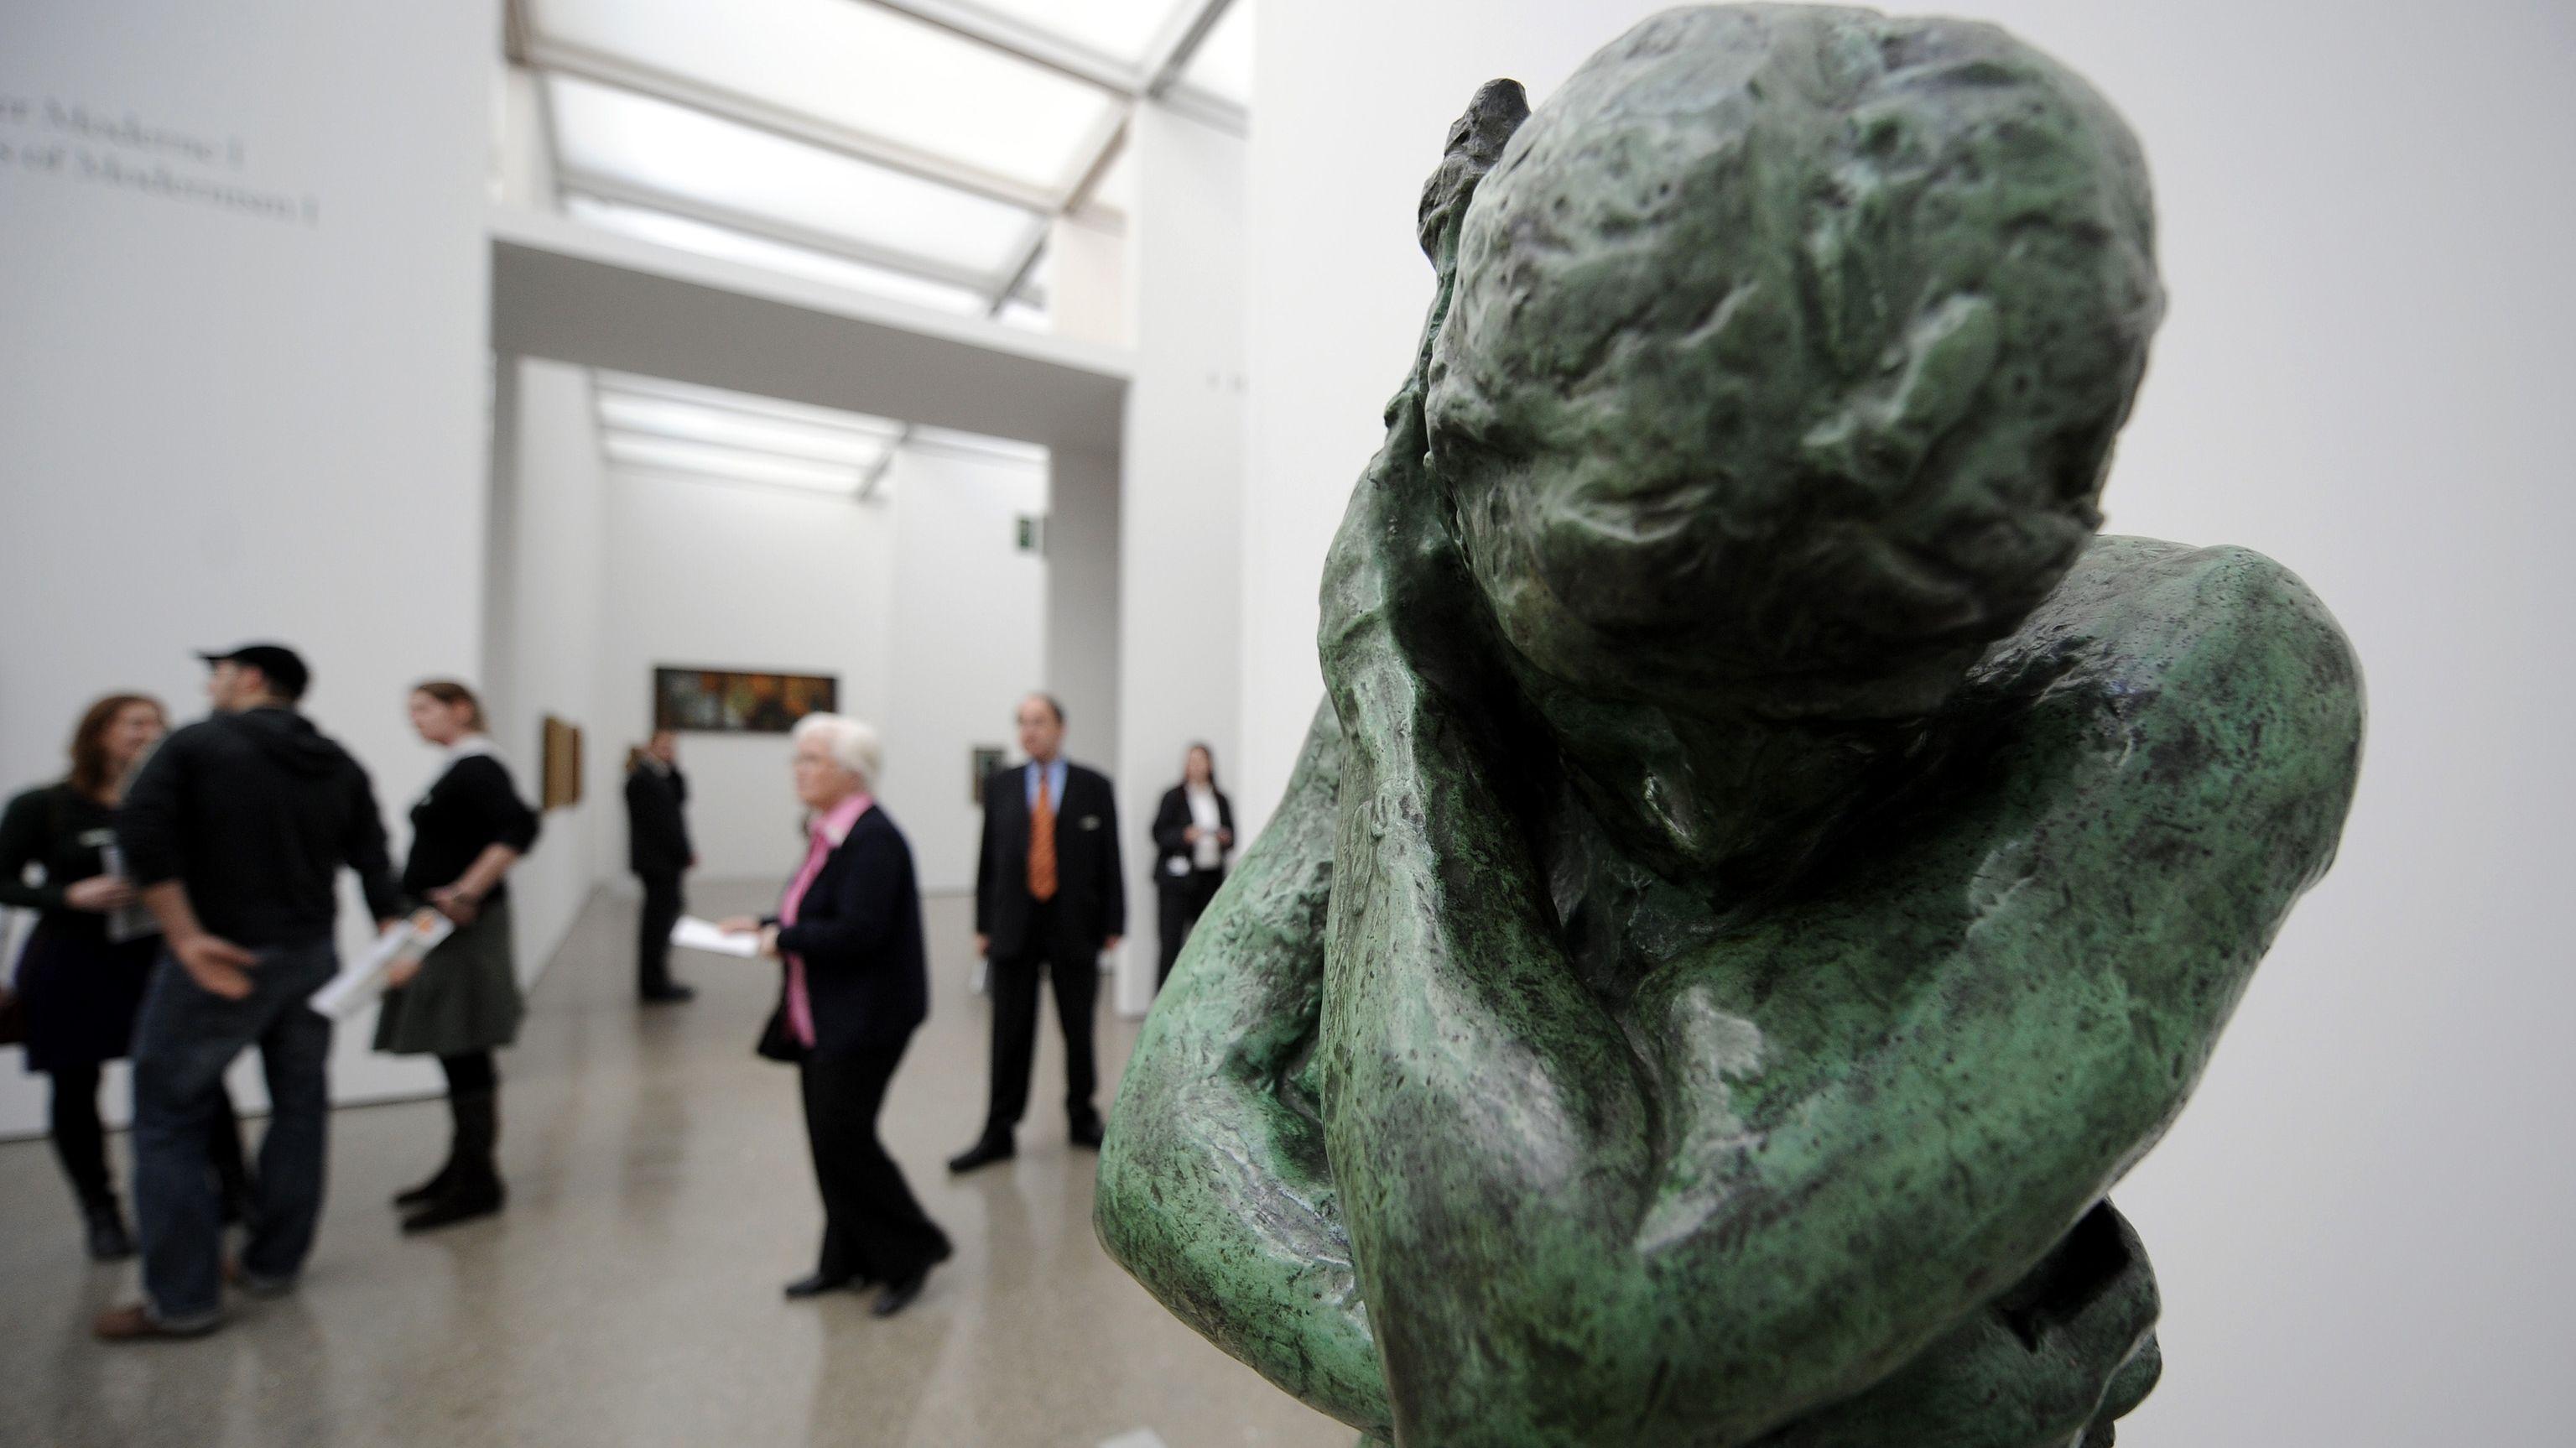 New Digital Art Project Is Bringing More Than 150,000 British Sculptures Online